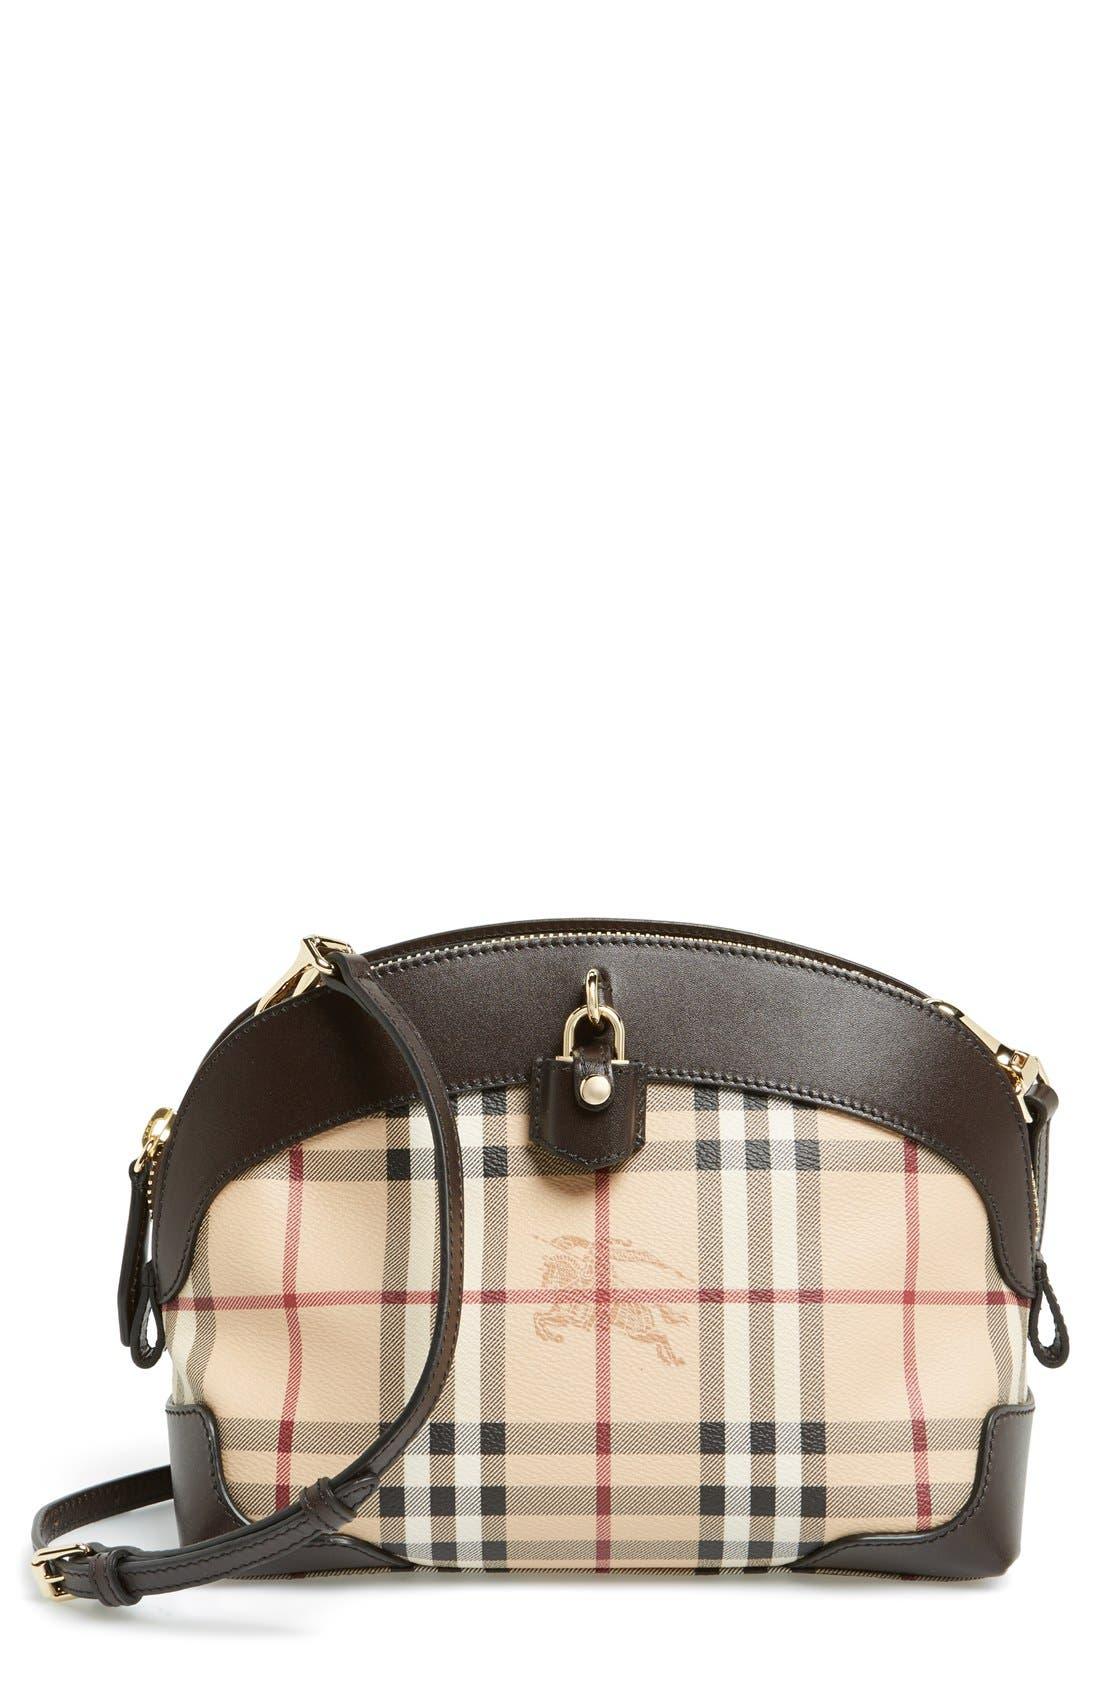 Main Image - Burberry 'Small Primrose' Crossbody Bag